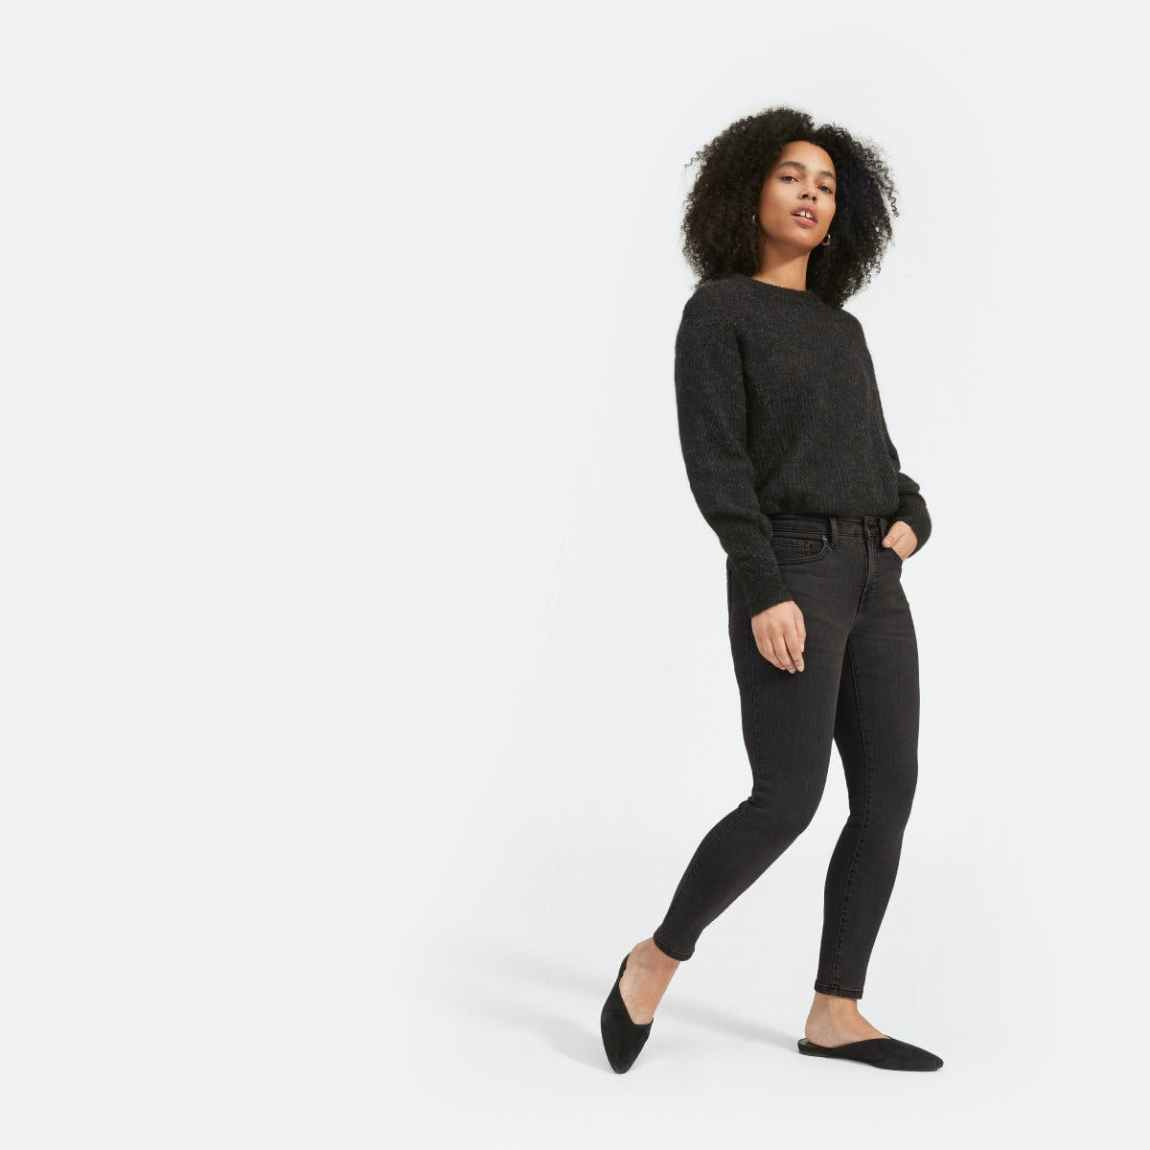 everlane, everlane jeans, everlane denim, japanese denim, skinny jeans, cropped jeans, mid rise jeans, washed black denim, black denim, denimblog, denim blog